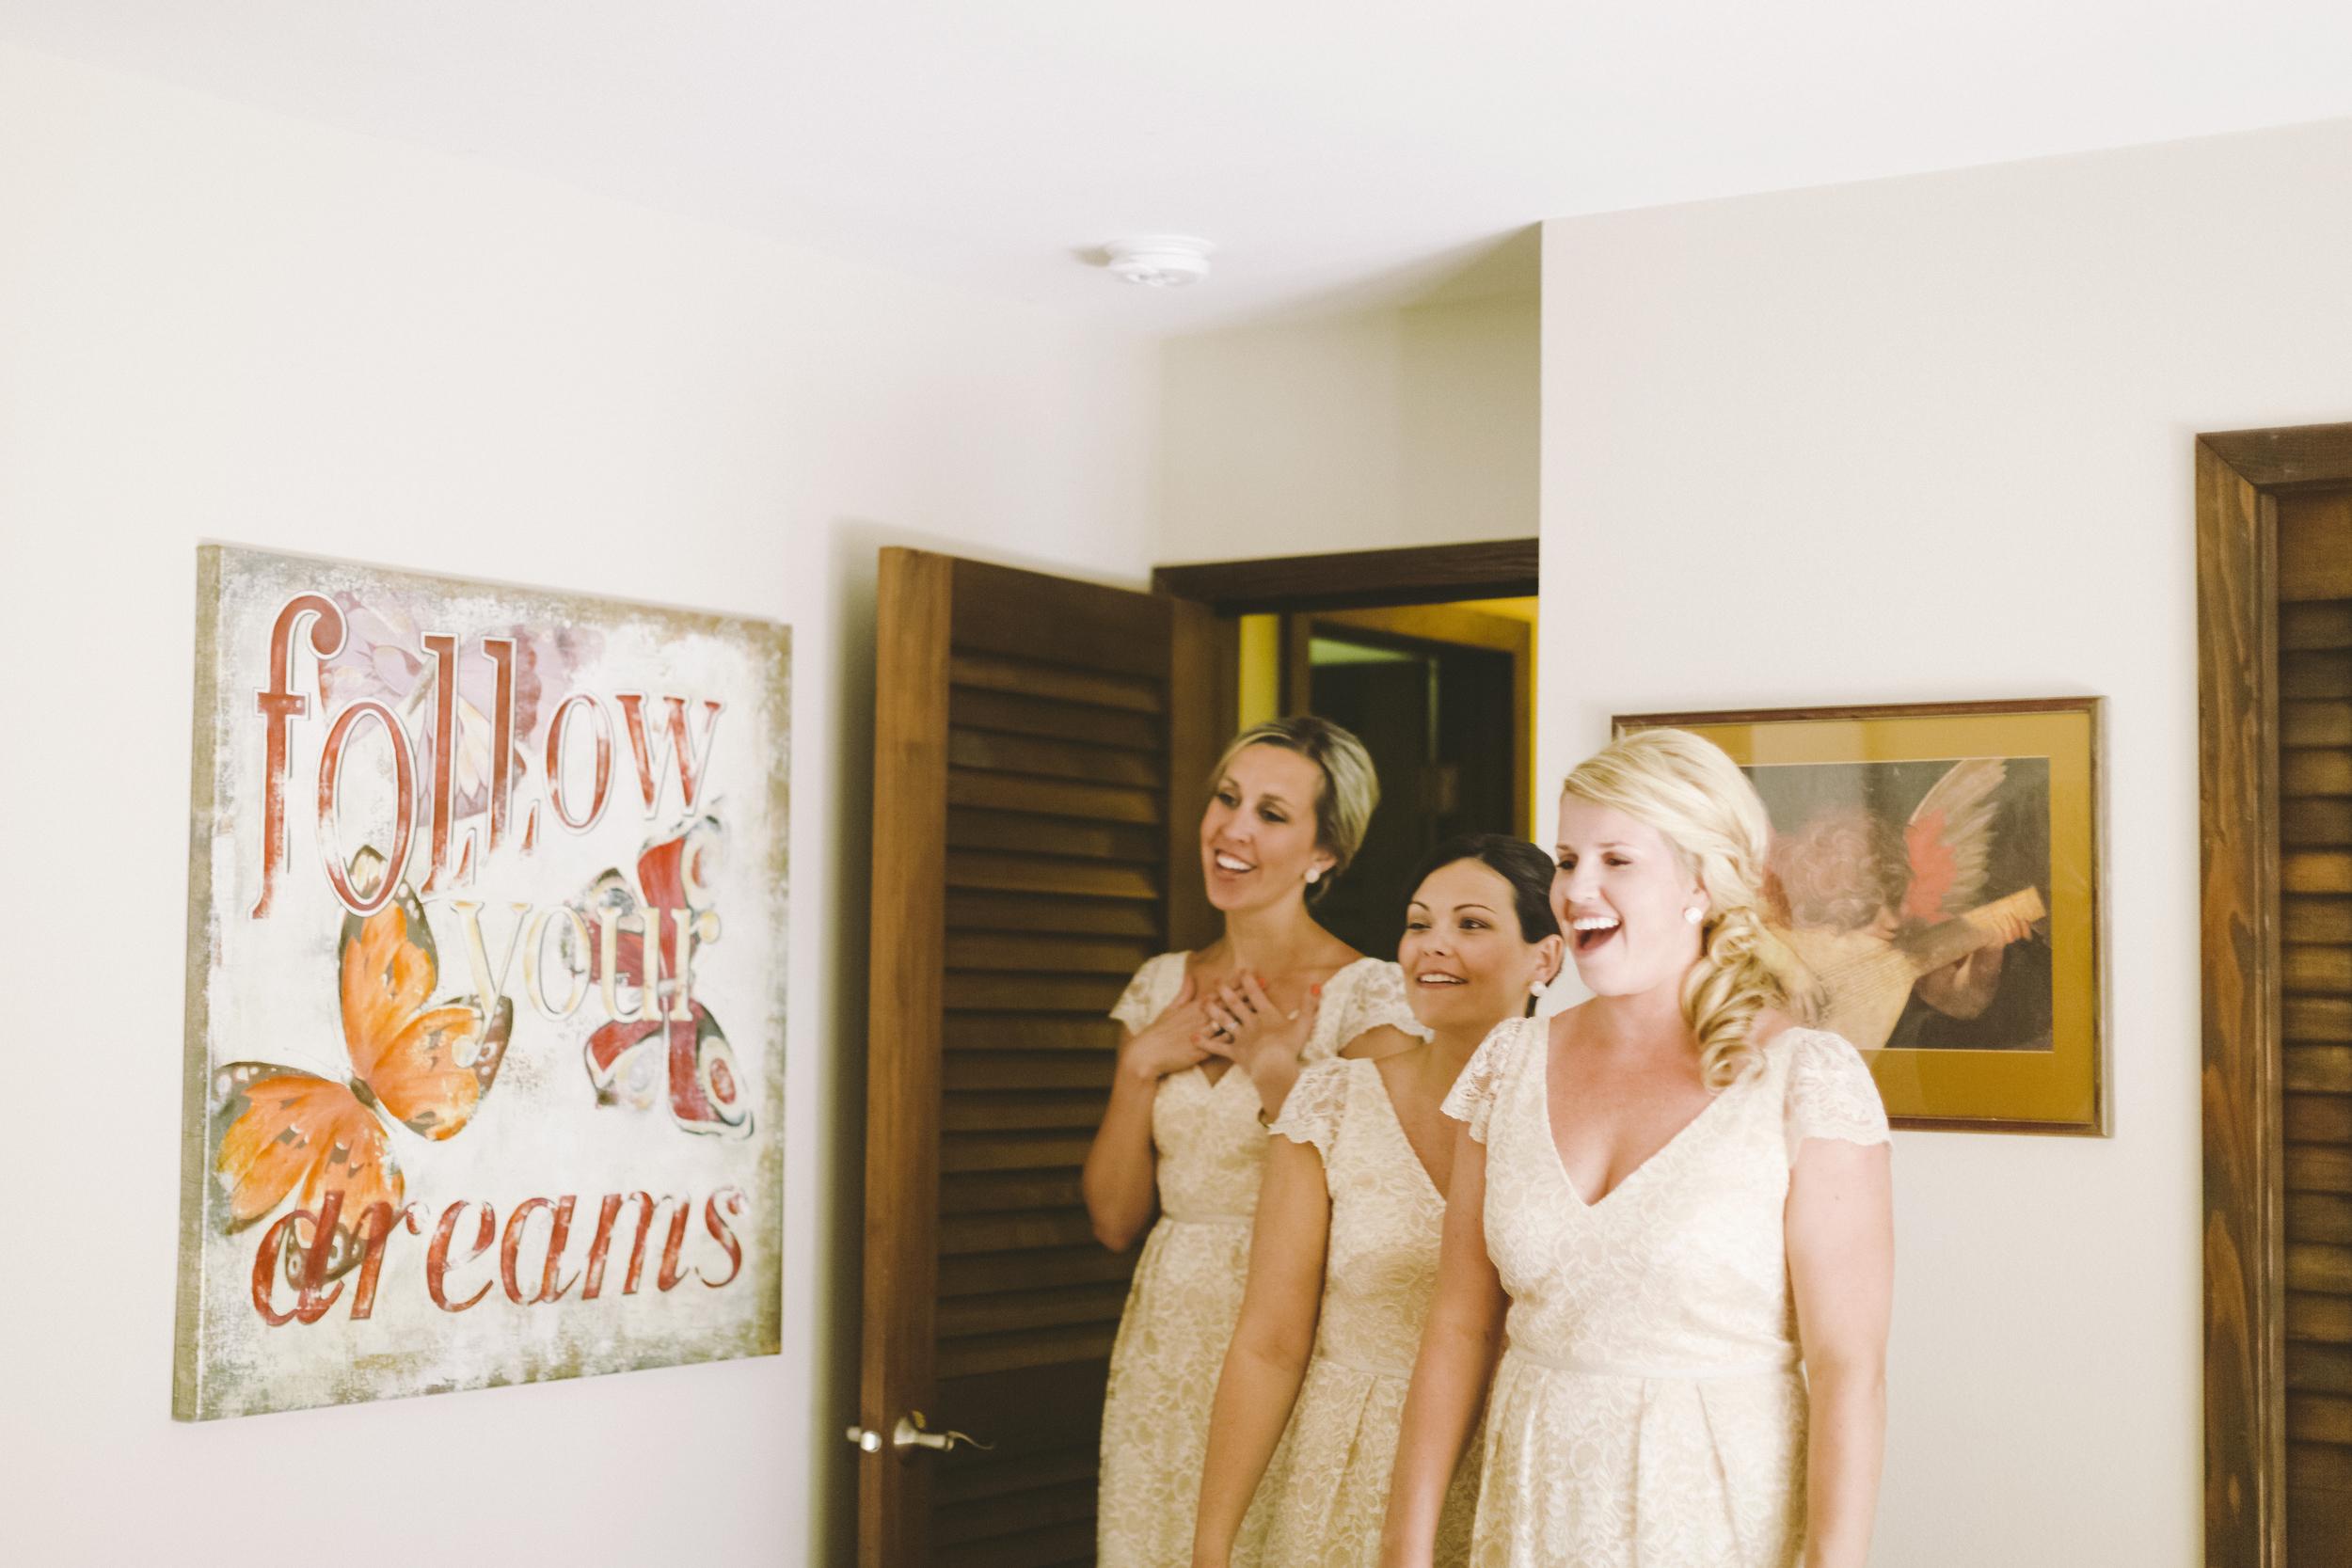 angie-diaz-photography-maui-wedding-mel-matt-10.jpg